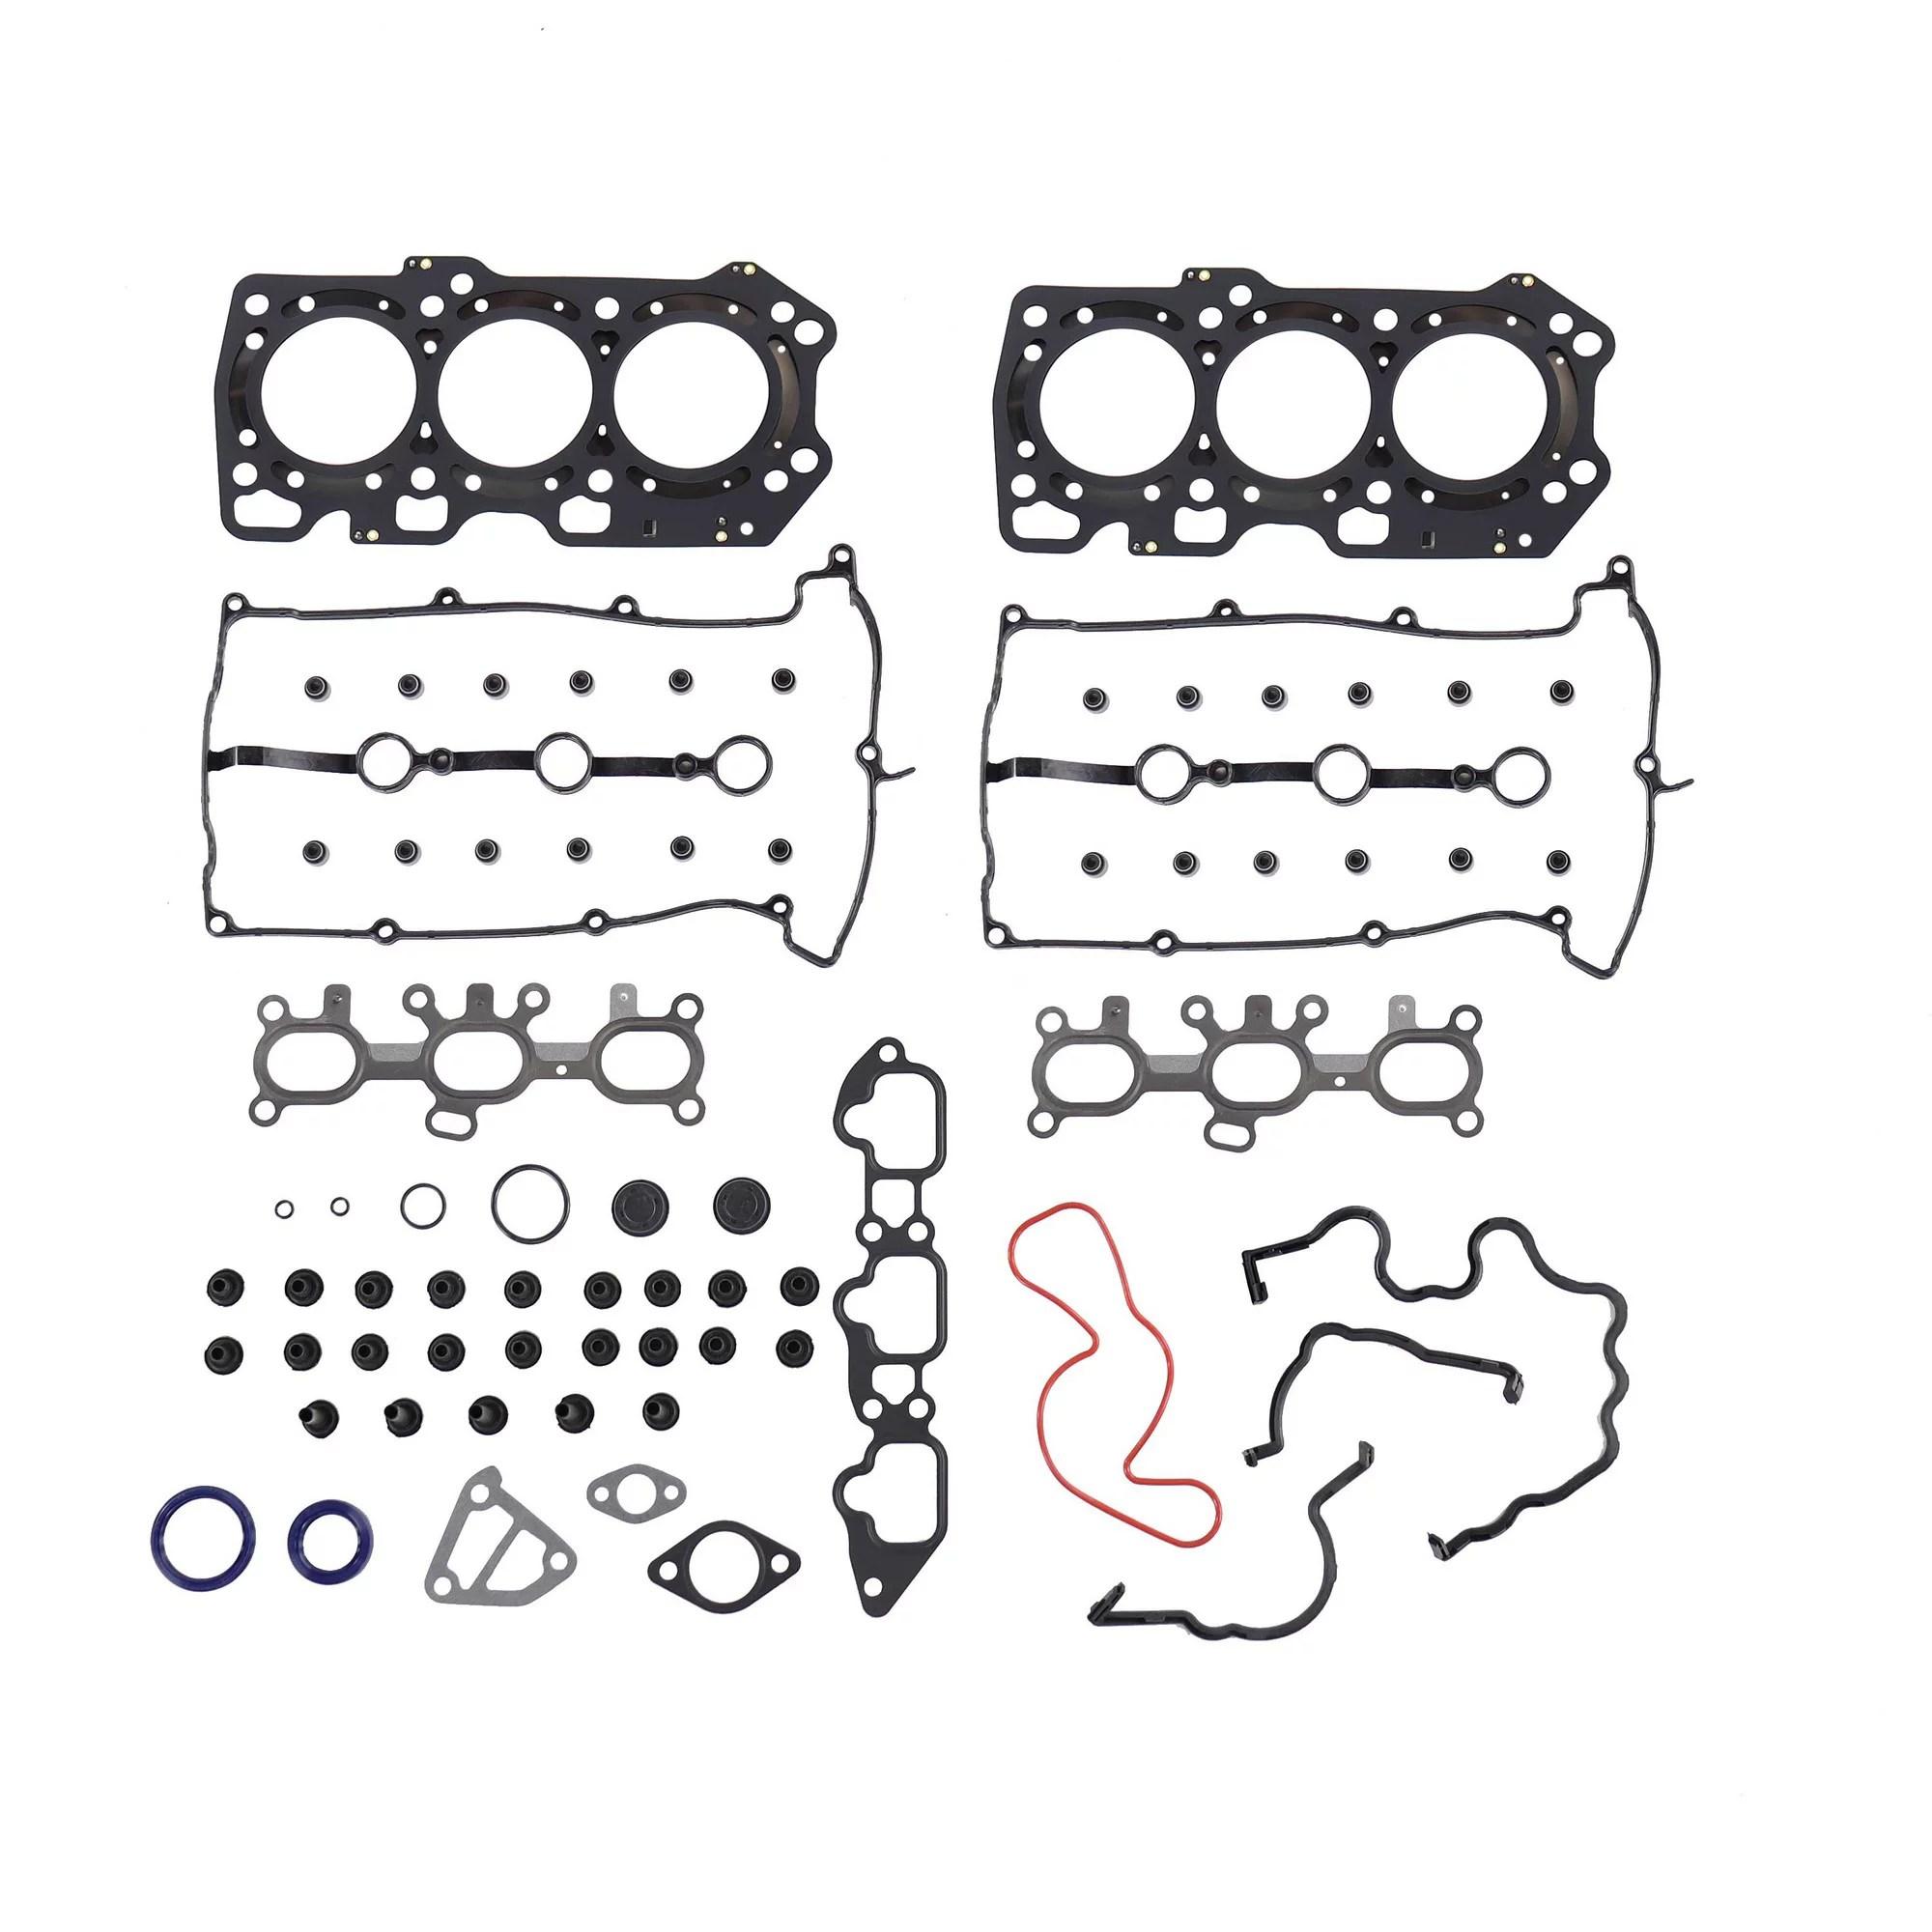 Dnj Hgs457 Head Gasket Set For 95 02 Mazda Millenia 2 5l